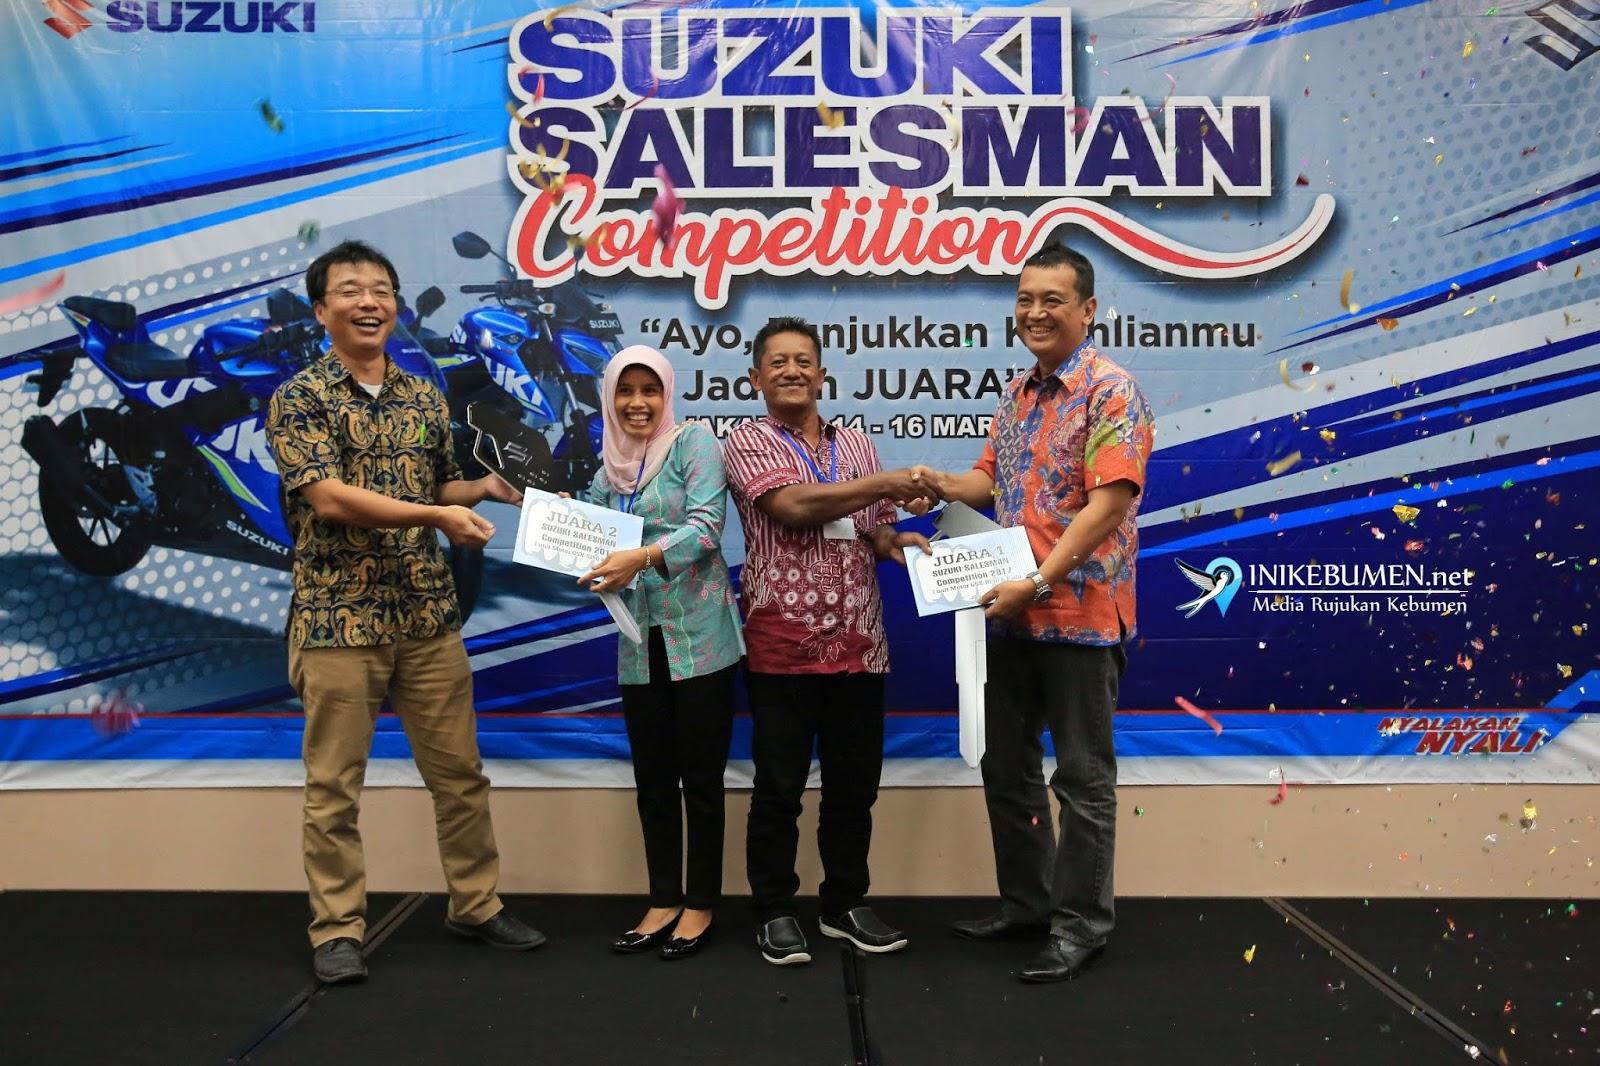 Susilo, Terpilih jadi Sales Motor Terbaik Suzuki Salesman Competition 2018